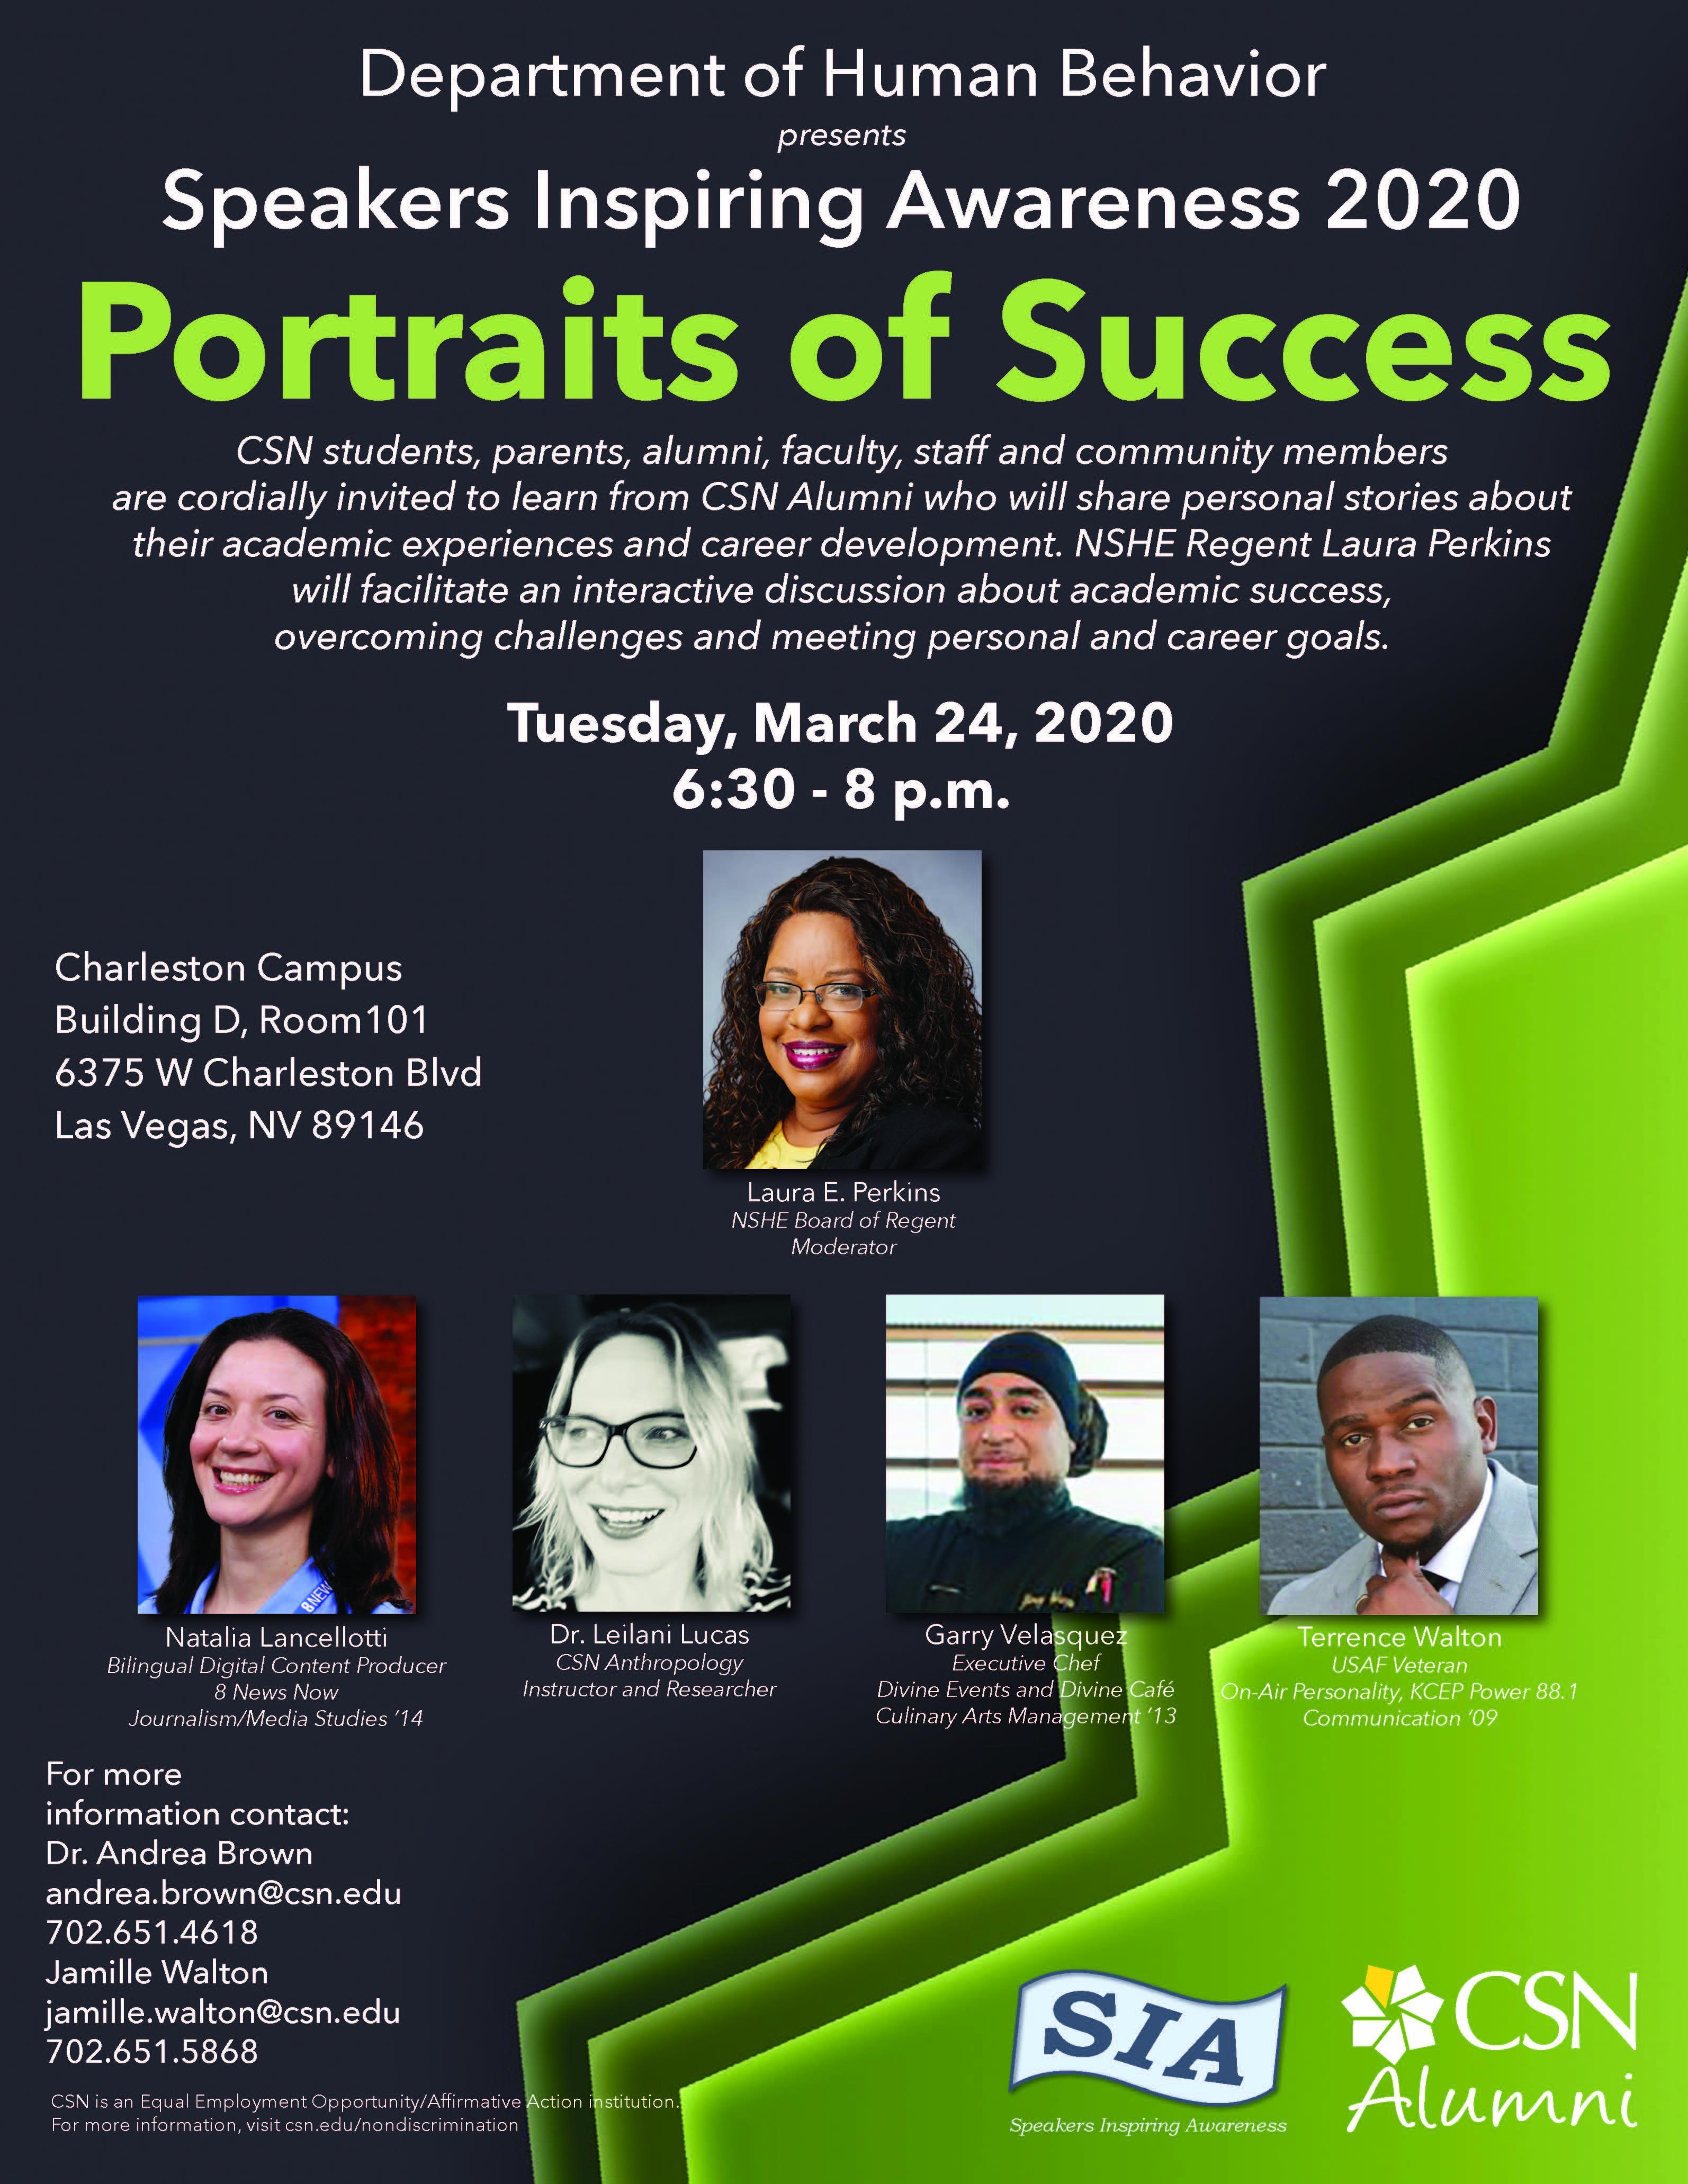 Speaker Inspiring Awareness 2020 Portraits of Success Flyer